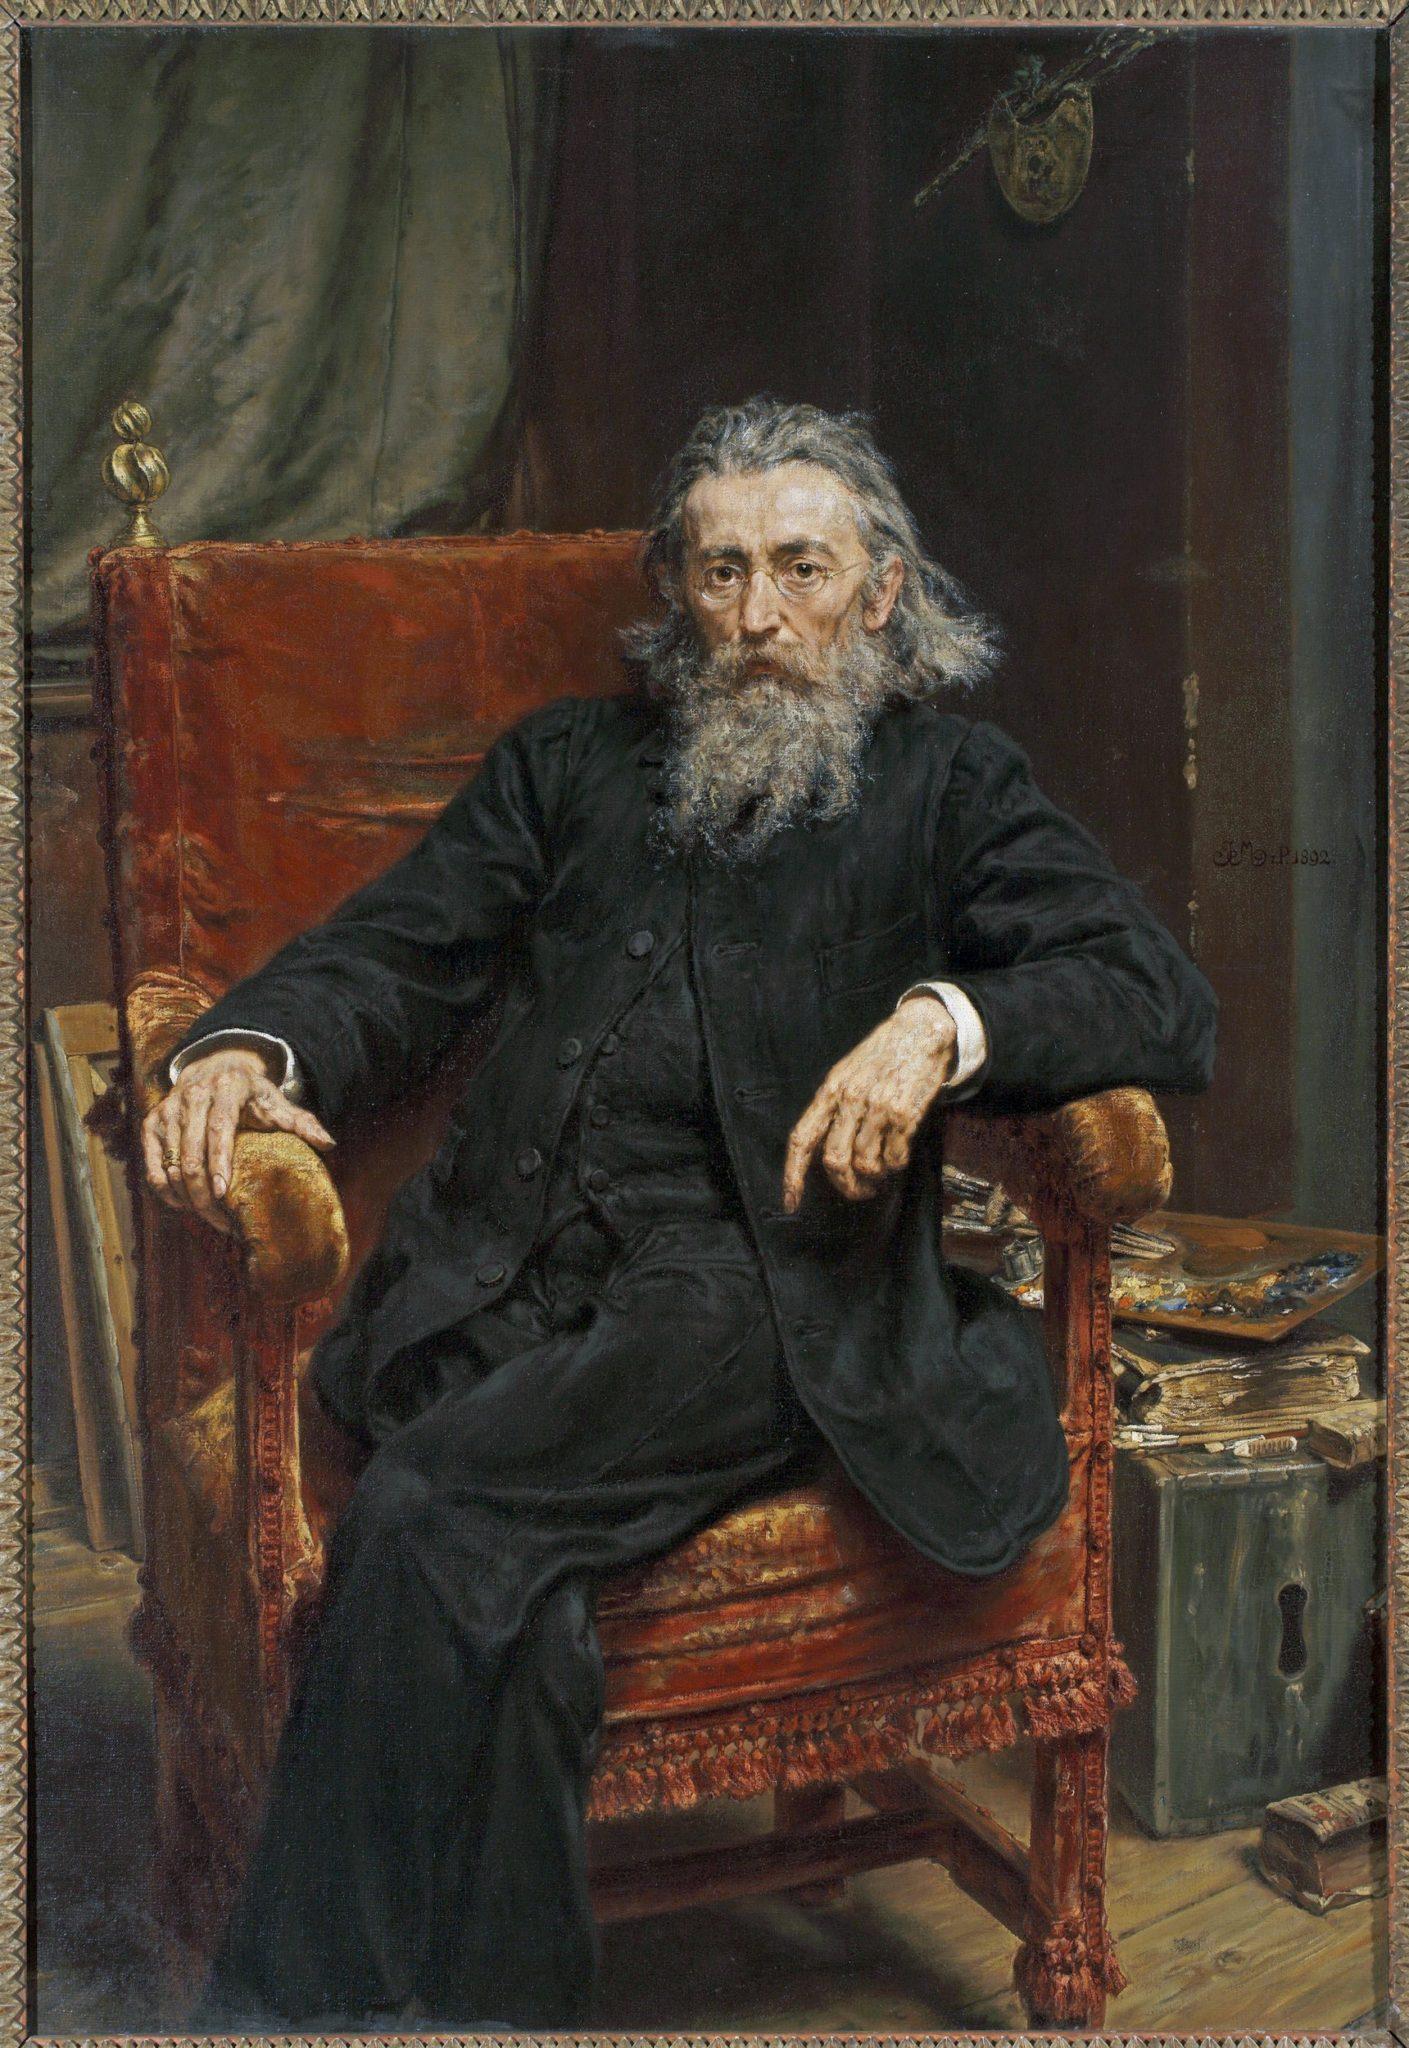 Jan Matejko, Self-portrait, 1892